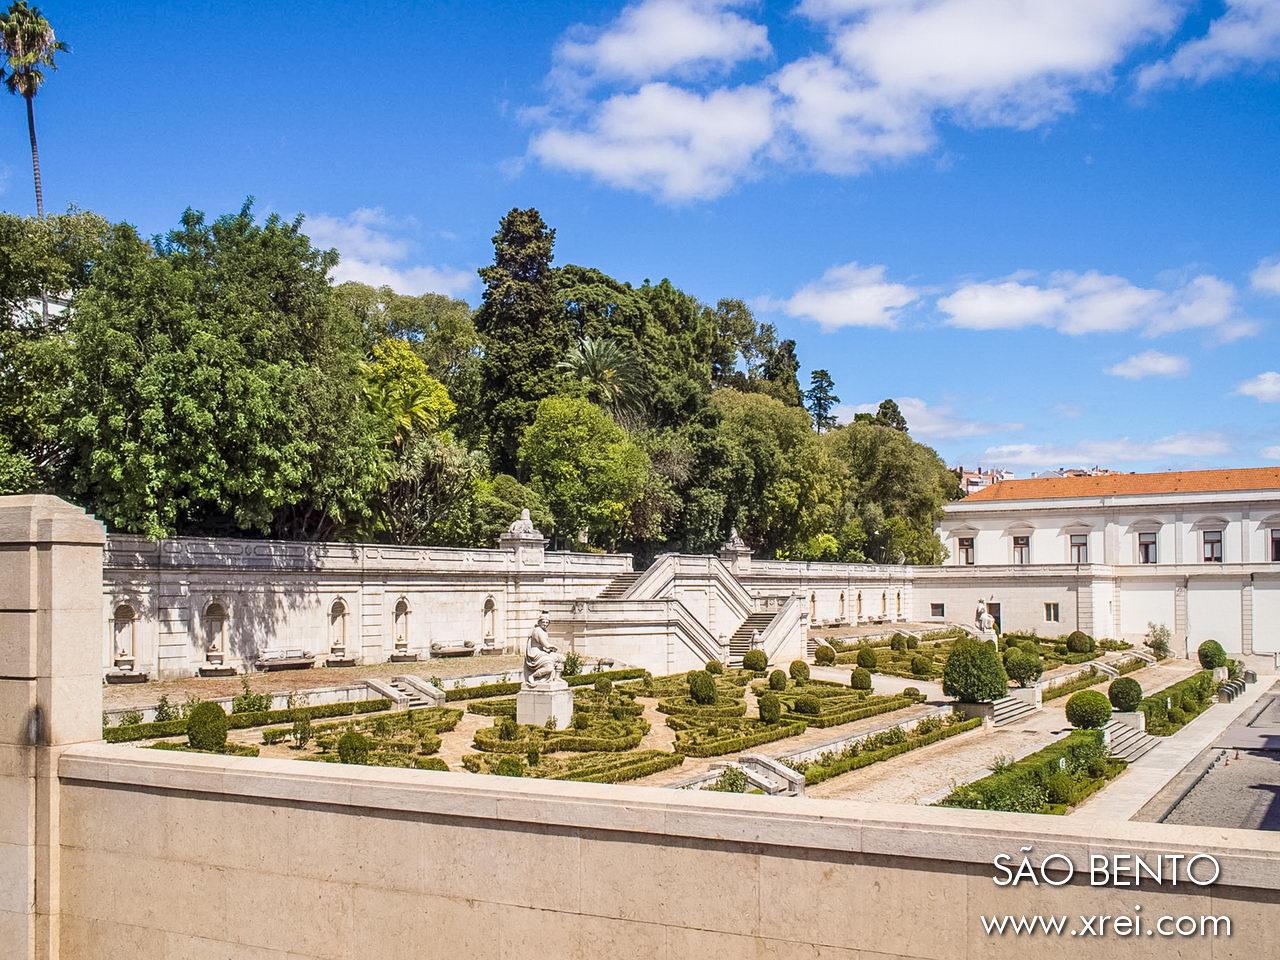 The gardens of the São Bento Palace are original from the 19th century, occupying an area of two hectares belonging to the former Convent of São Bento da Saúde